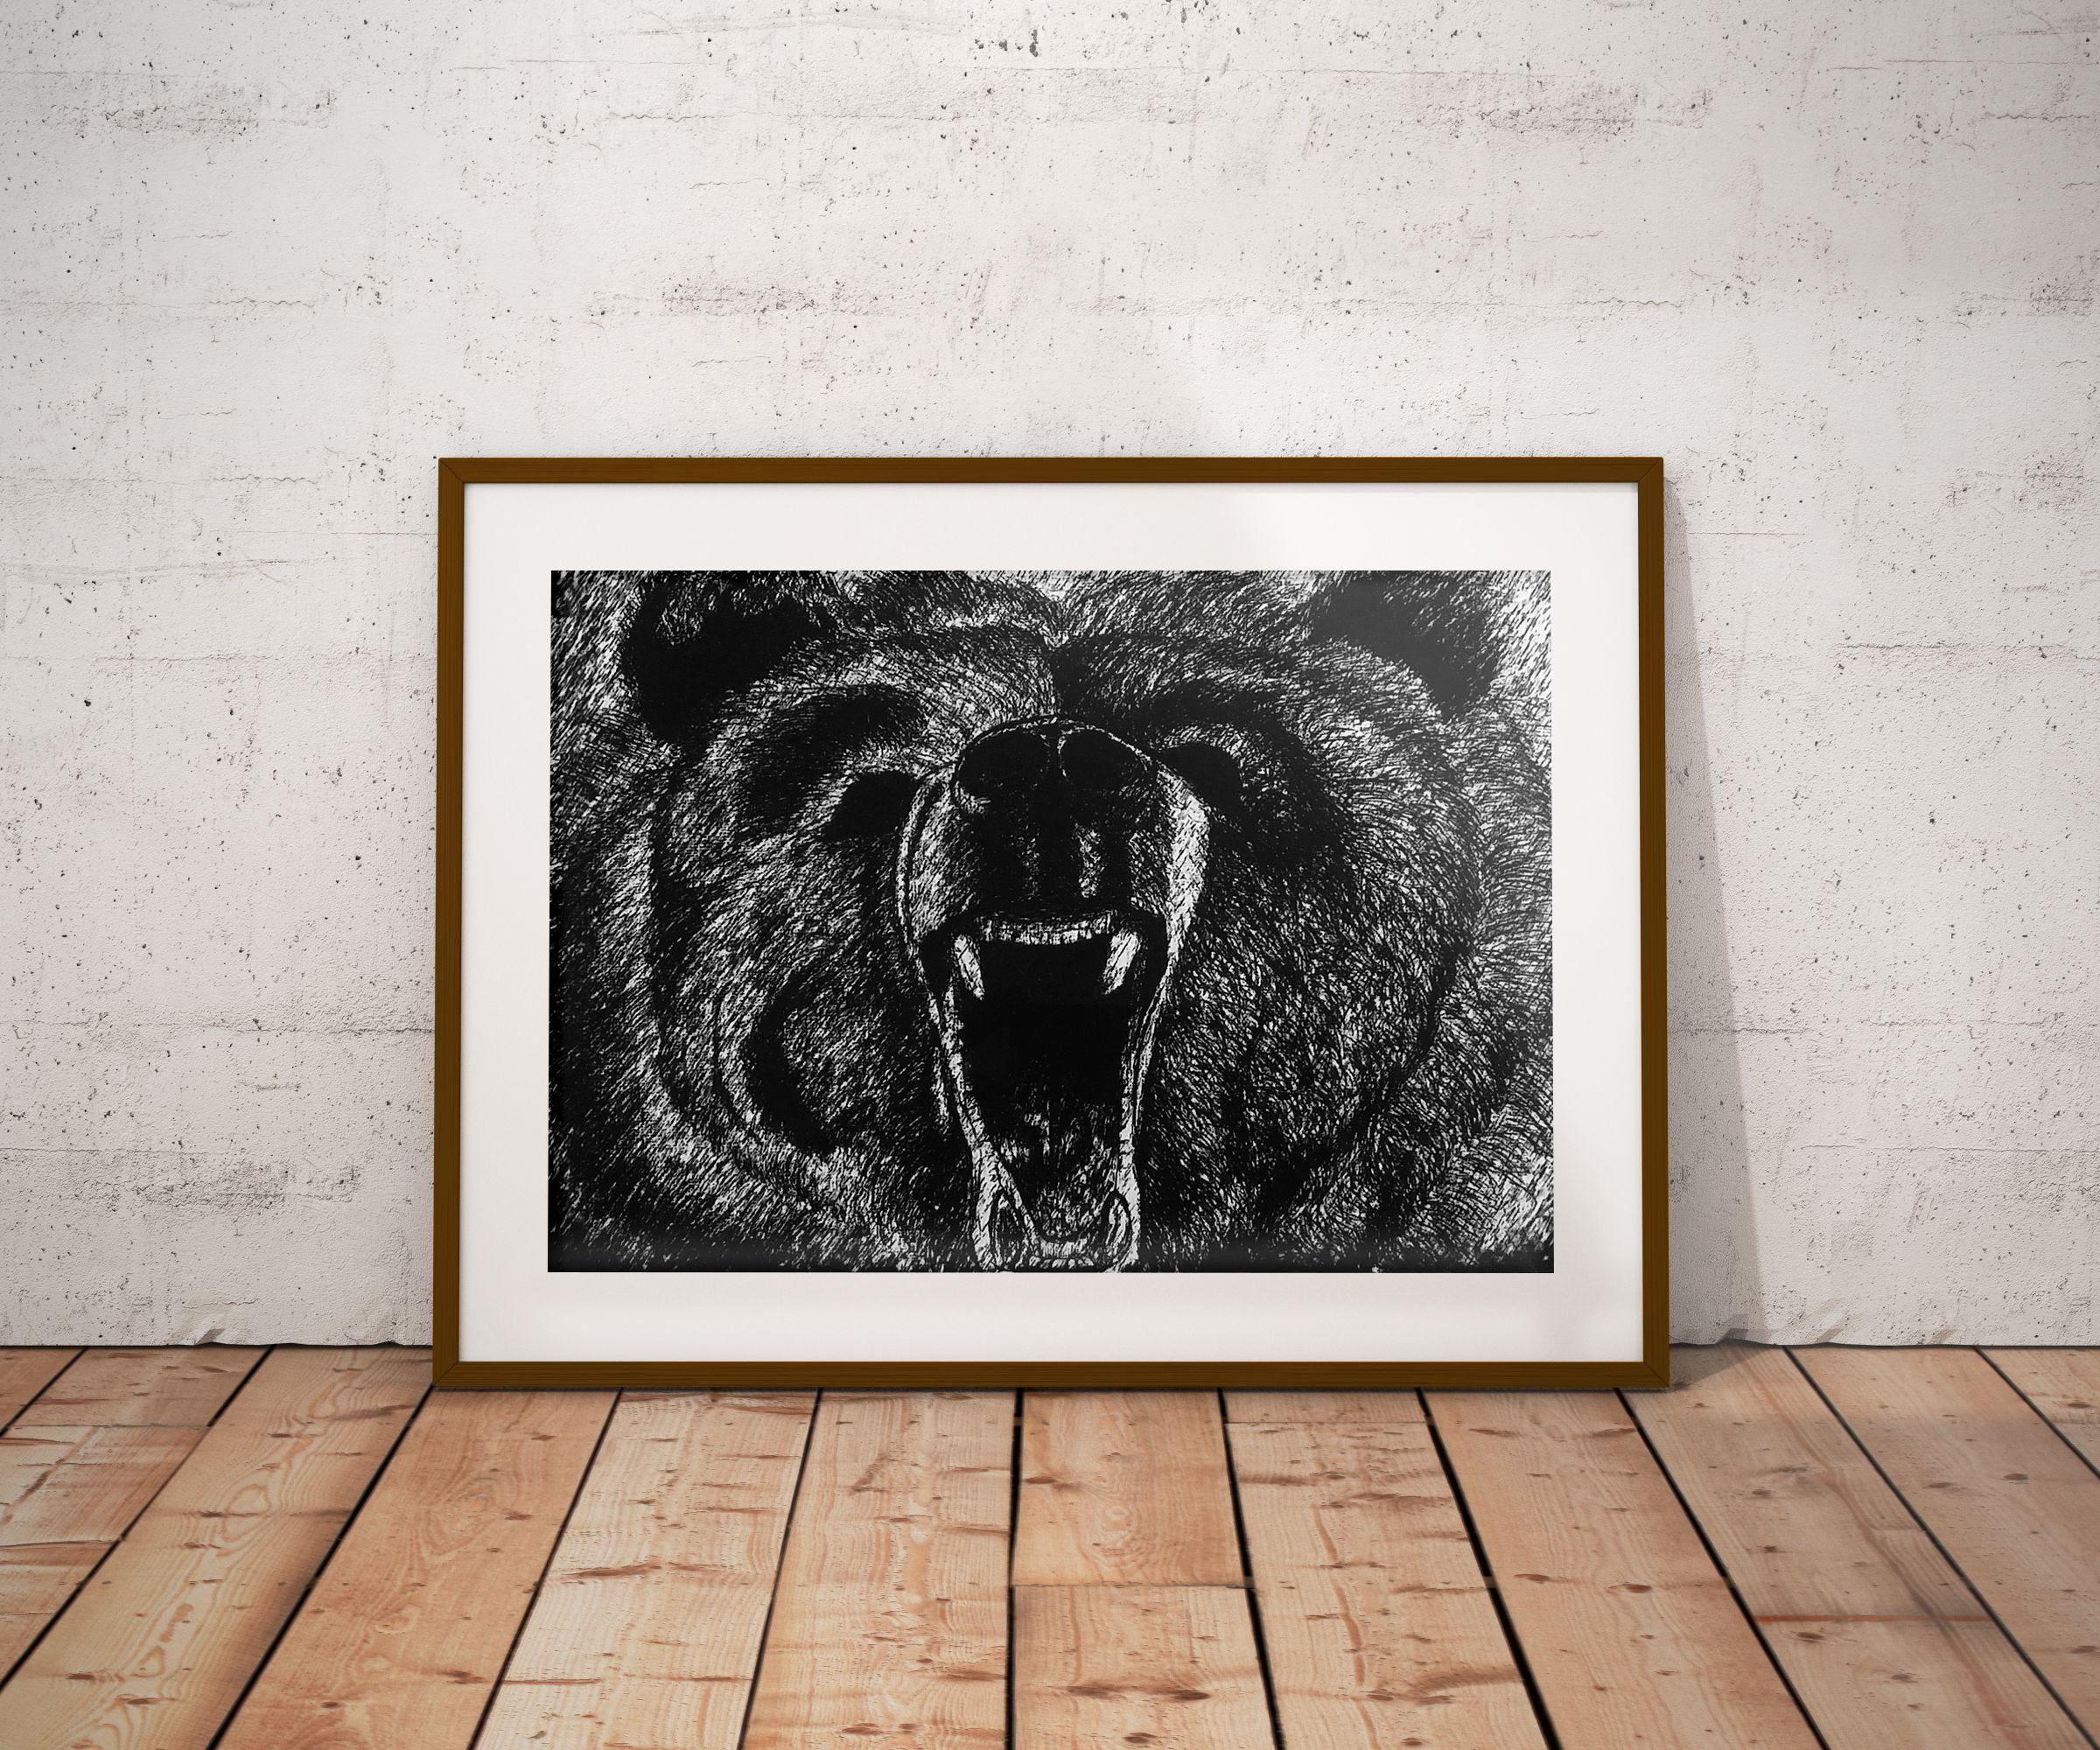 angry decor roaring gift roar wild present hunter hunt halloween hunting cave wildlife home christmas man animal bear